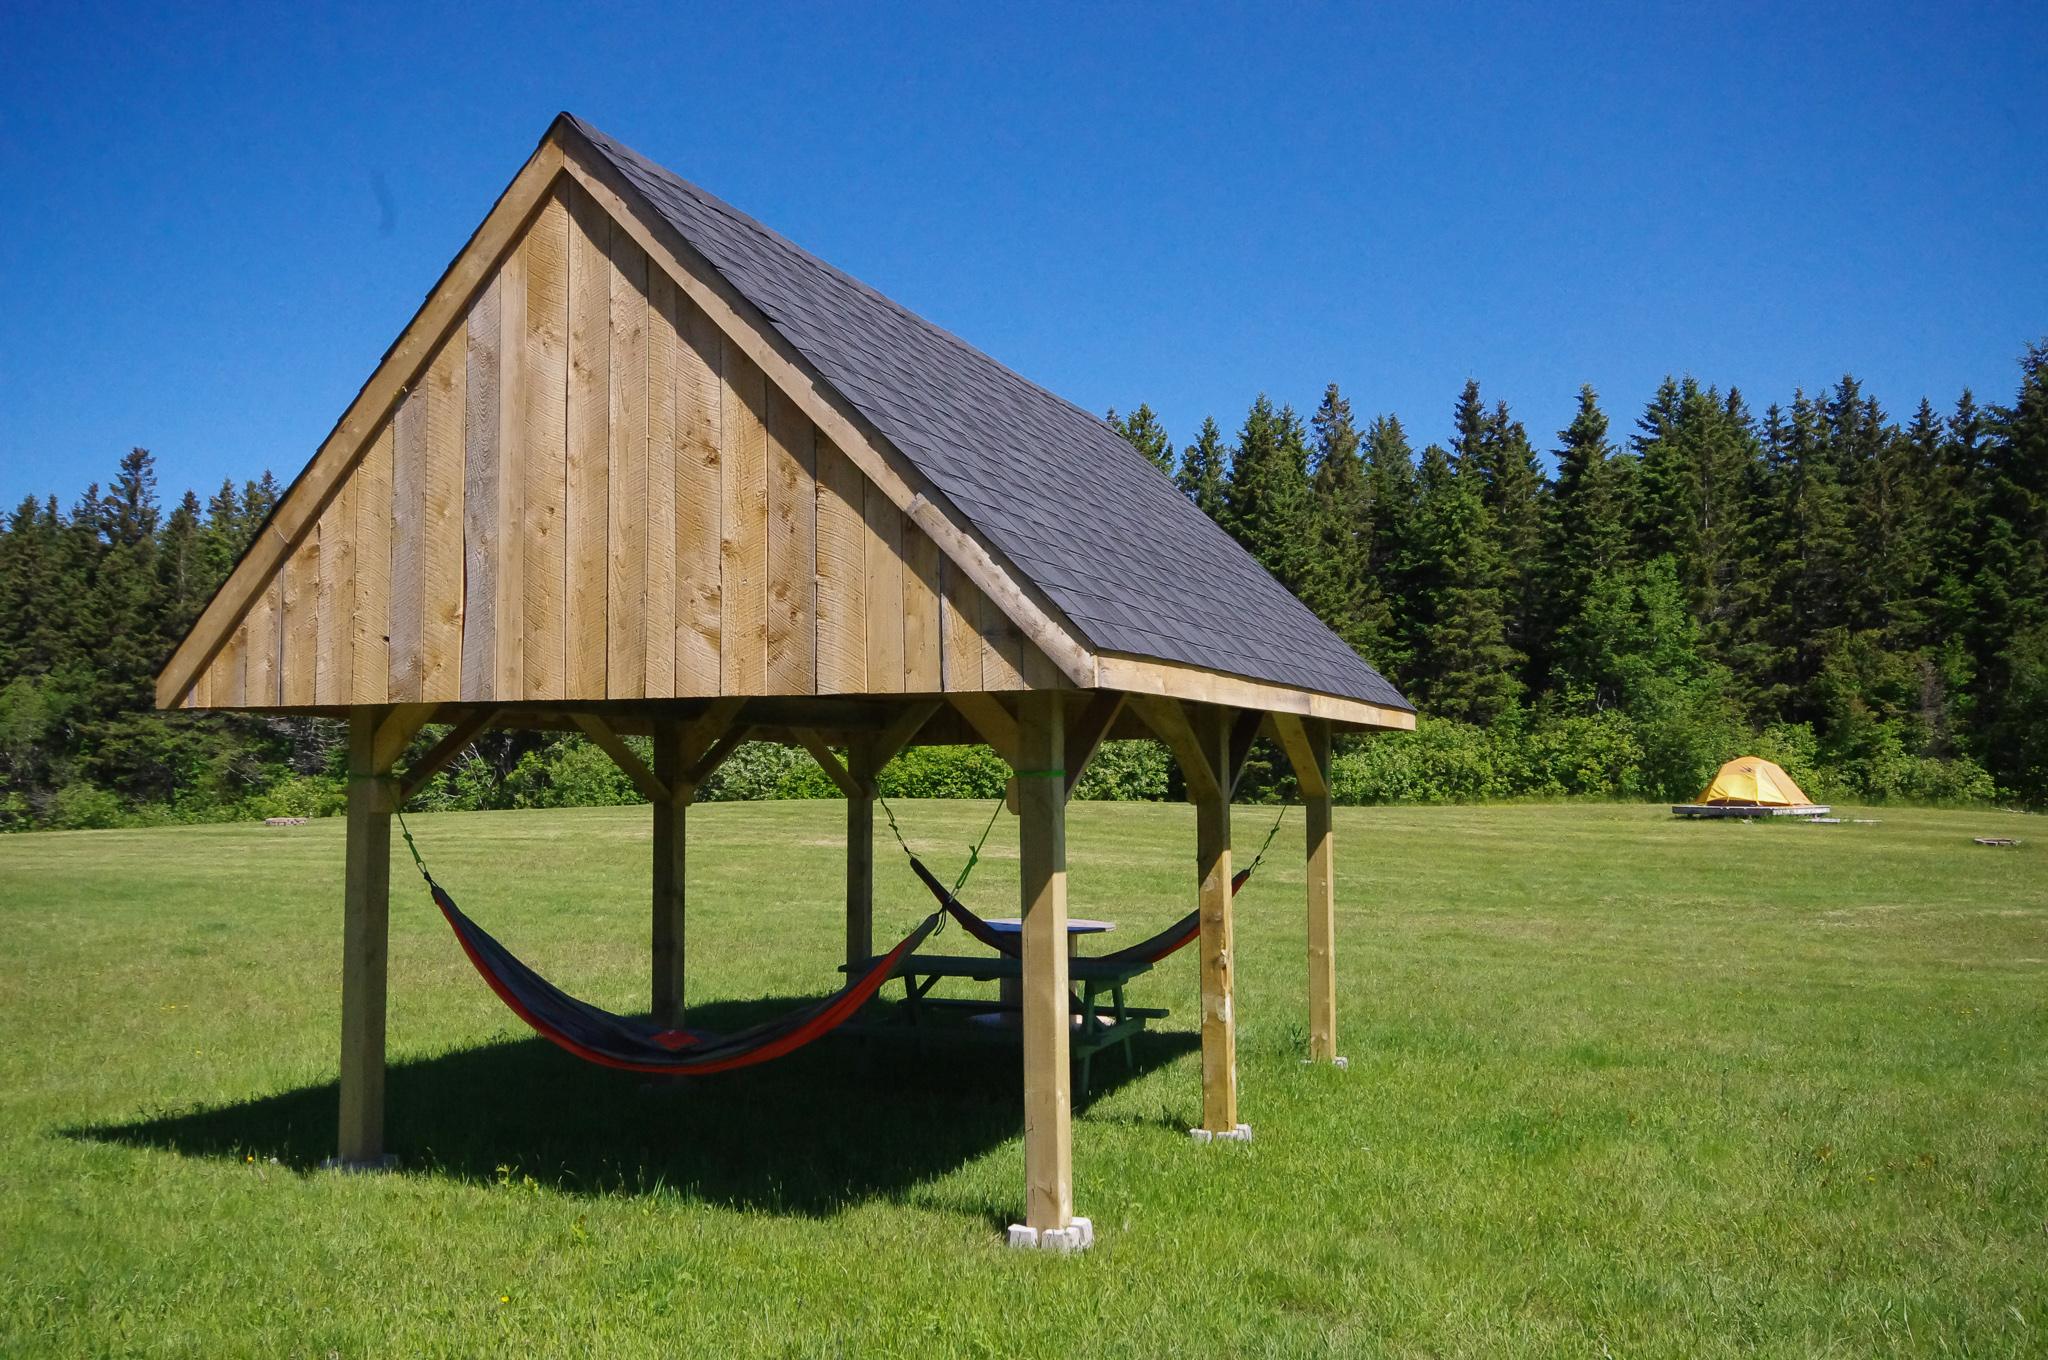 Relax in the hammocks